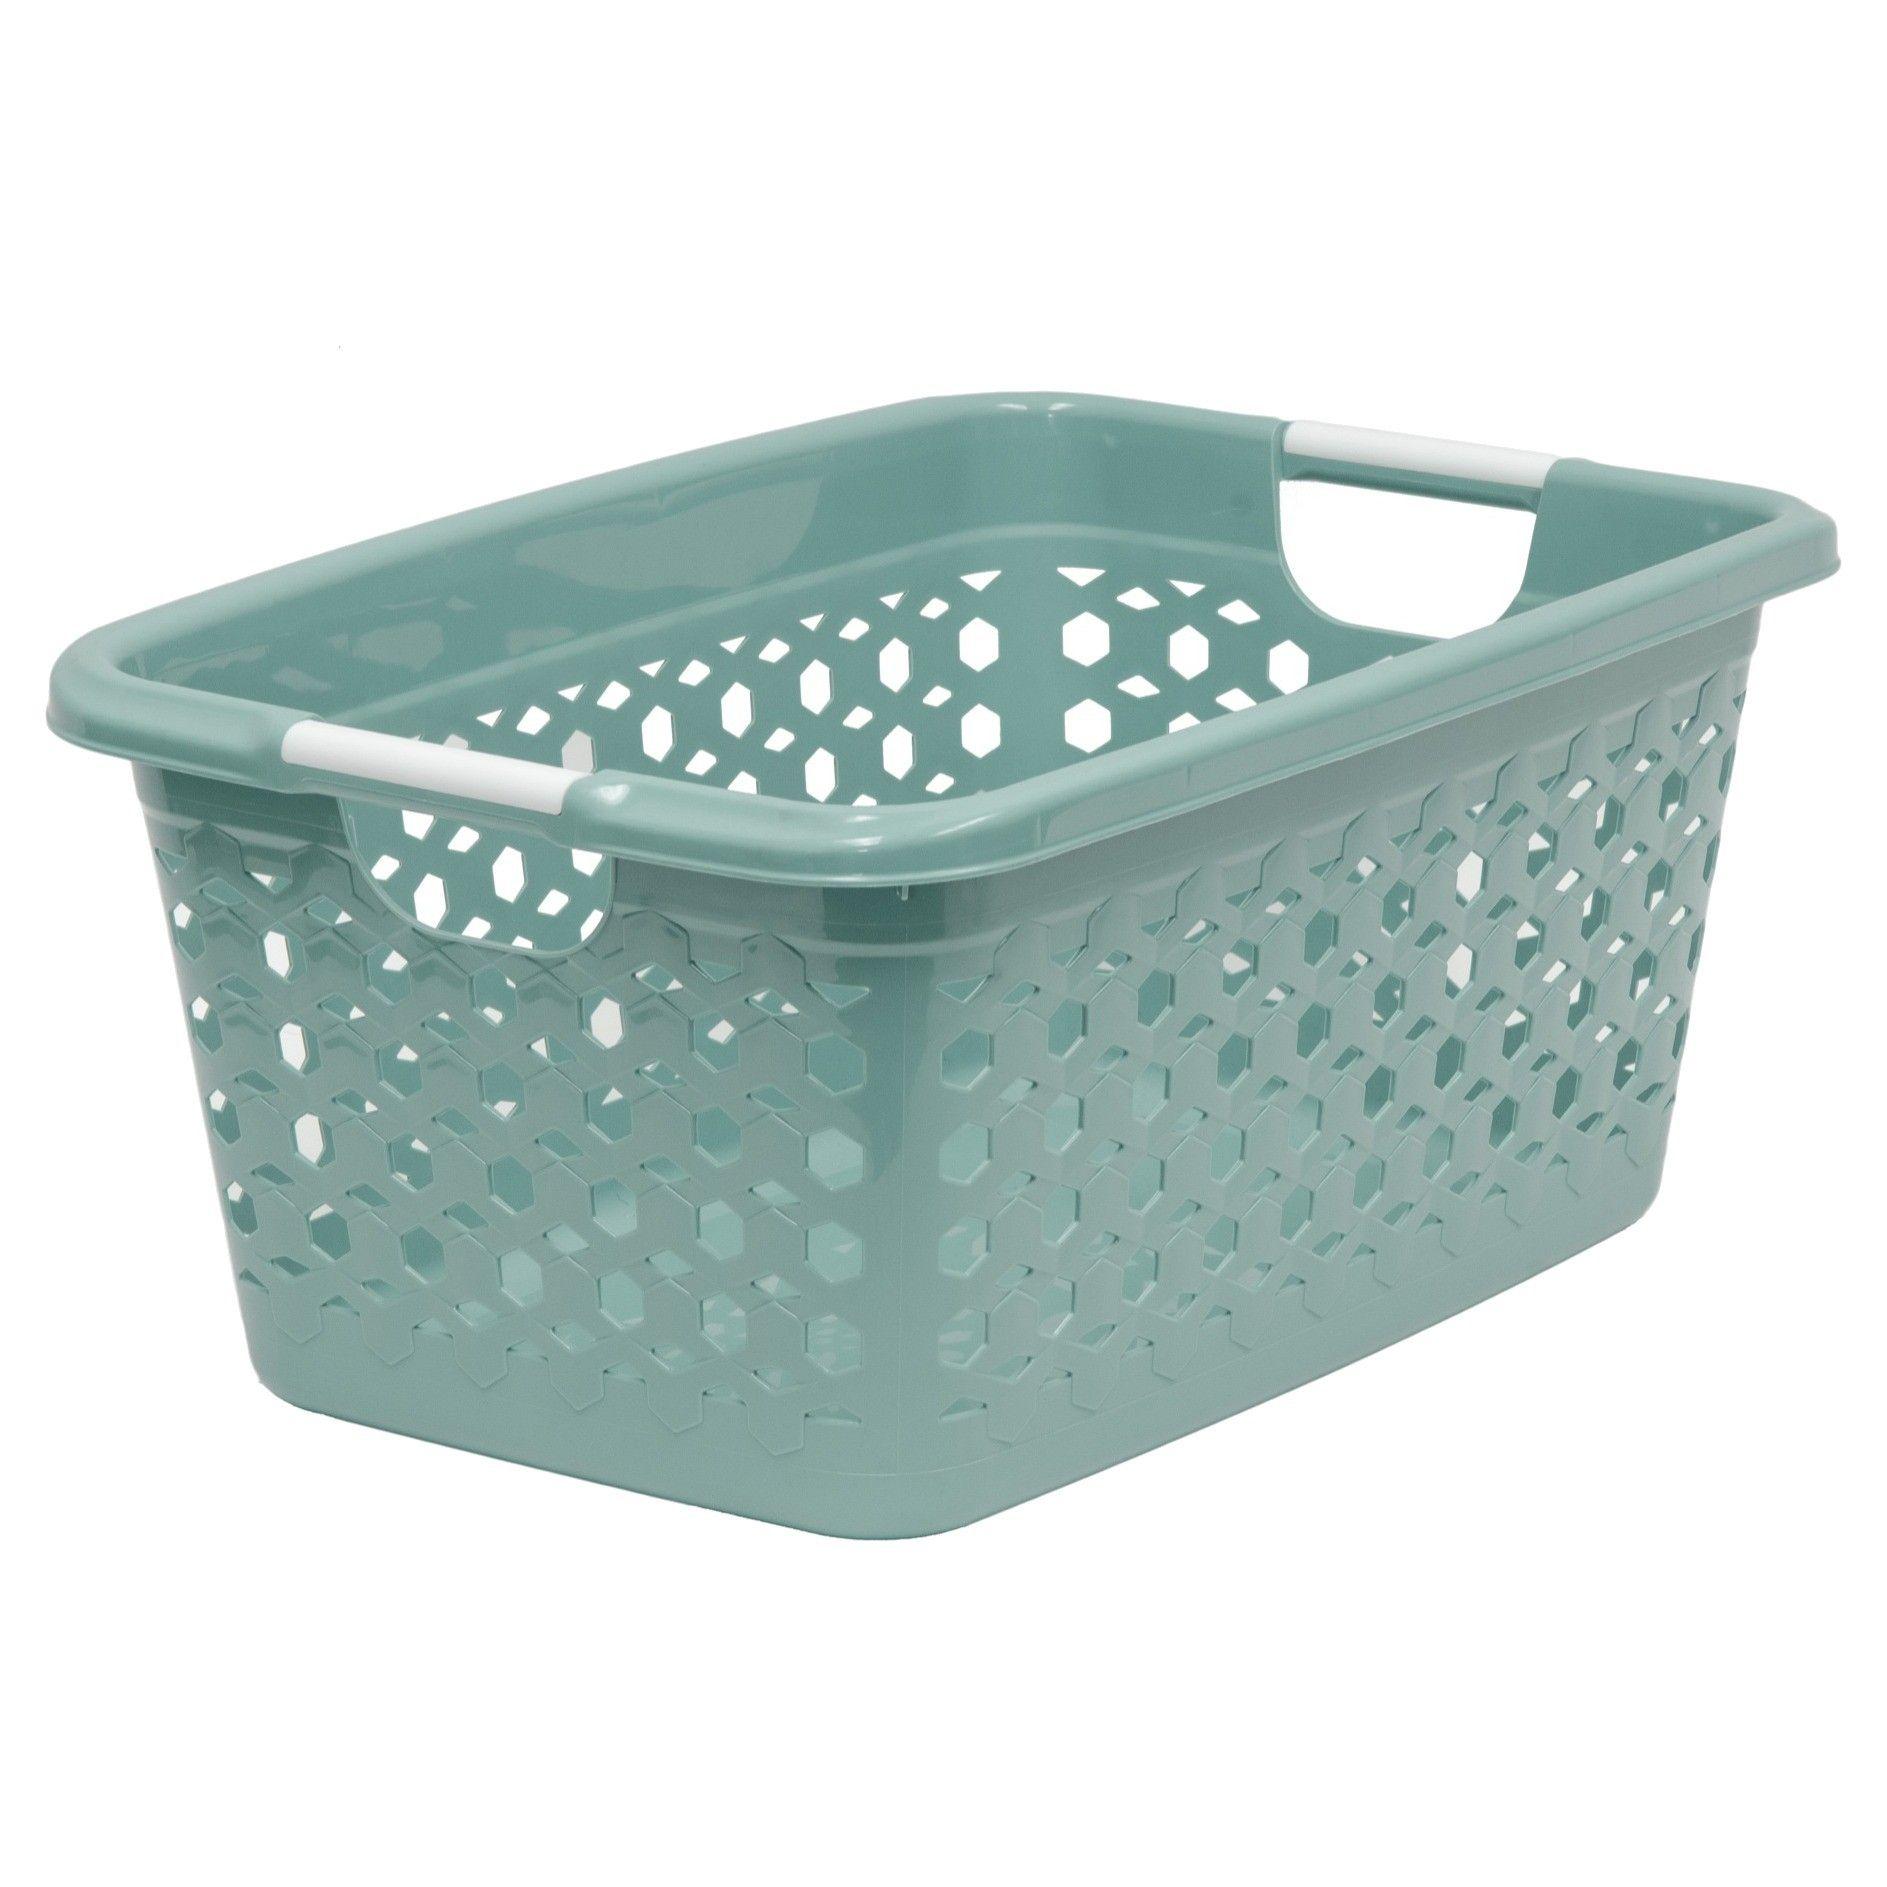 Home Logic Laundry Basket Teal Target Laundry Basket Green Laundry Target Laundry Basket